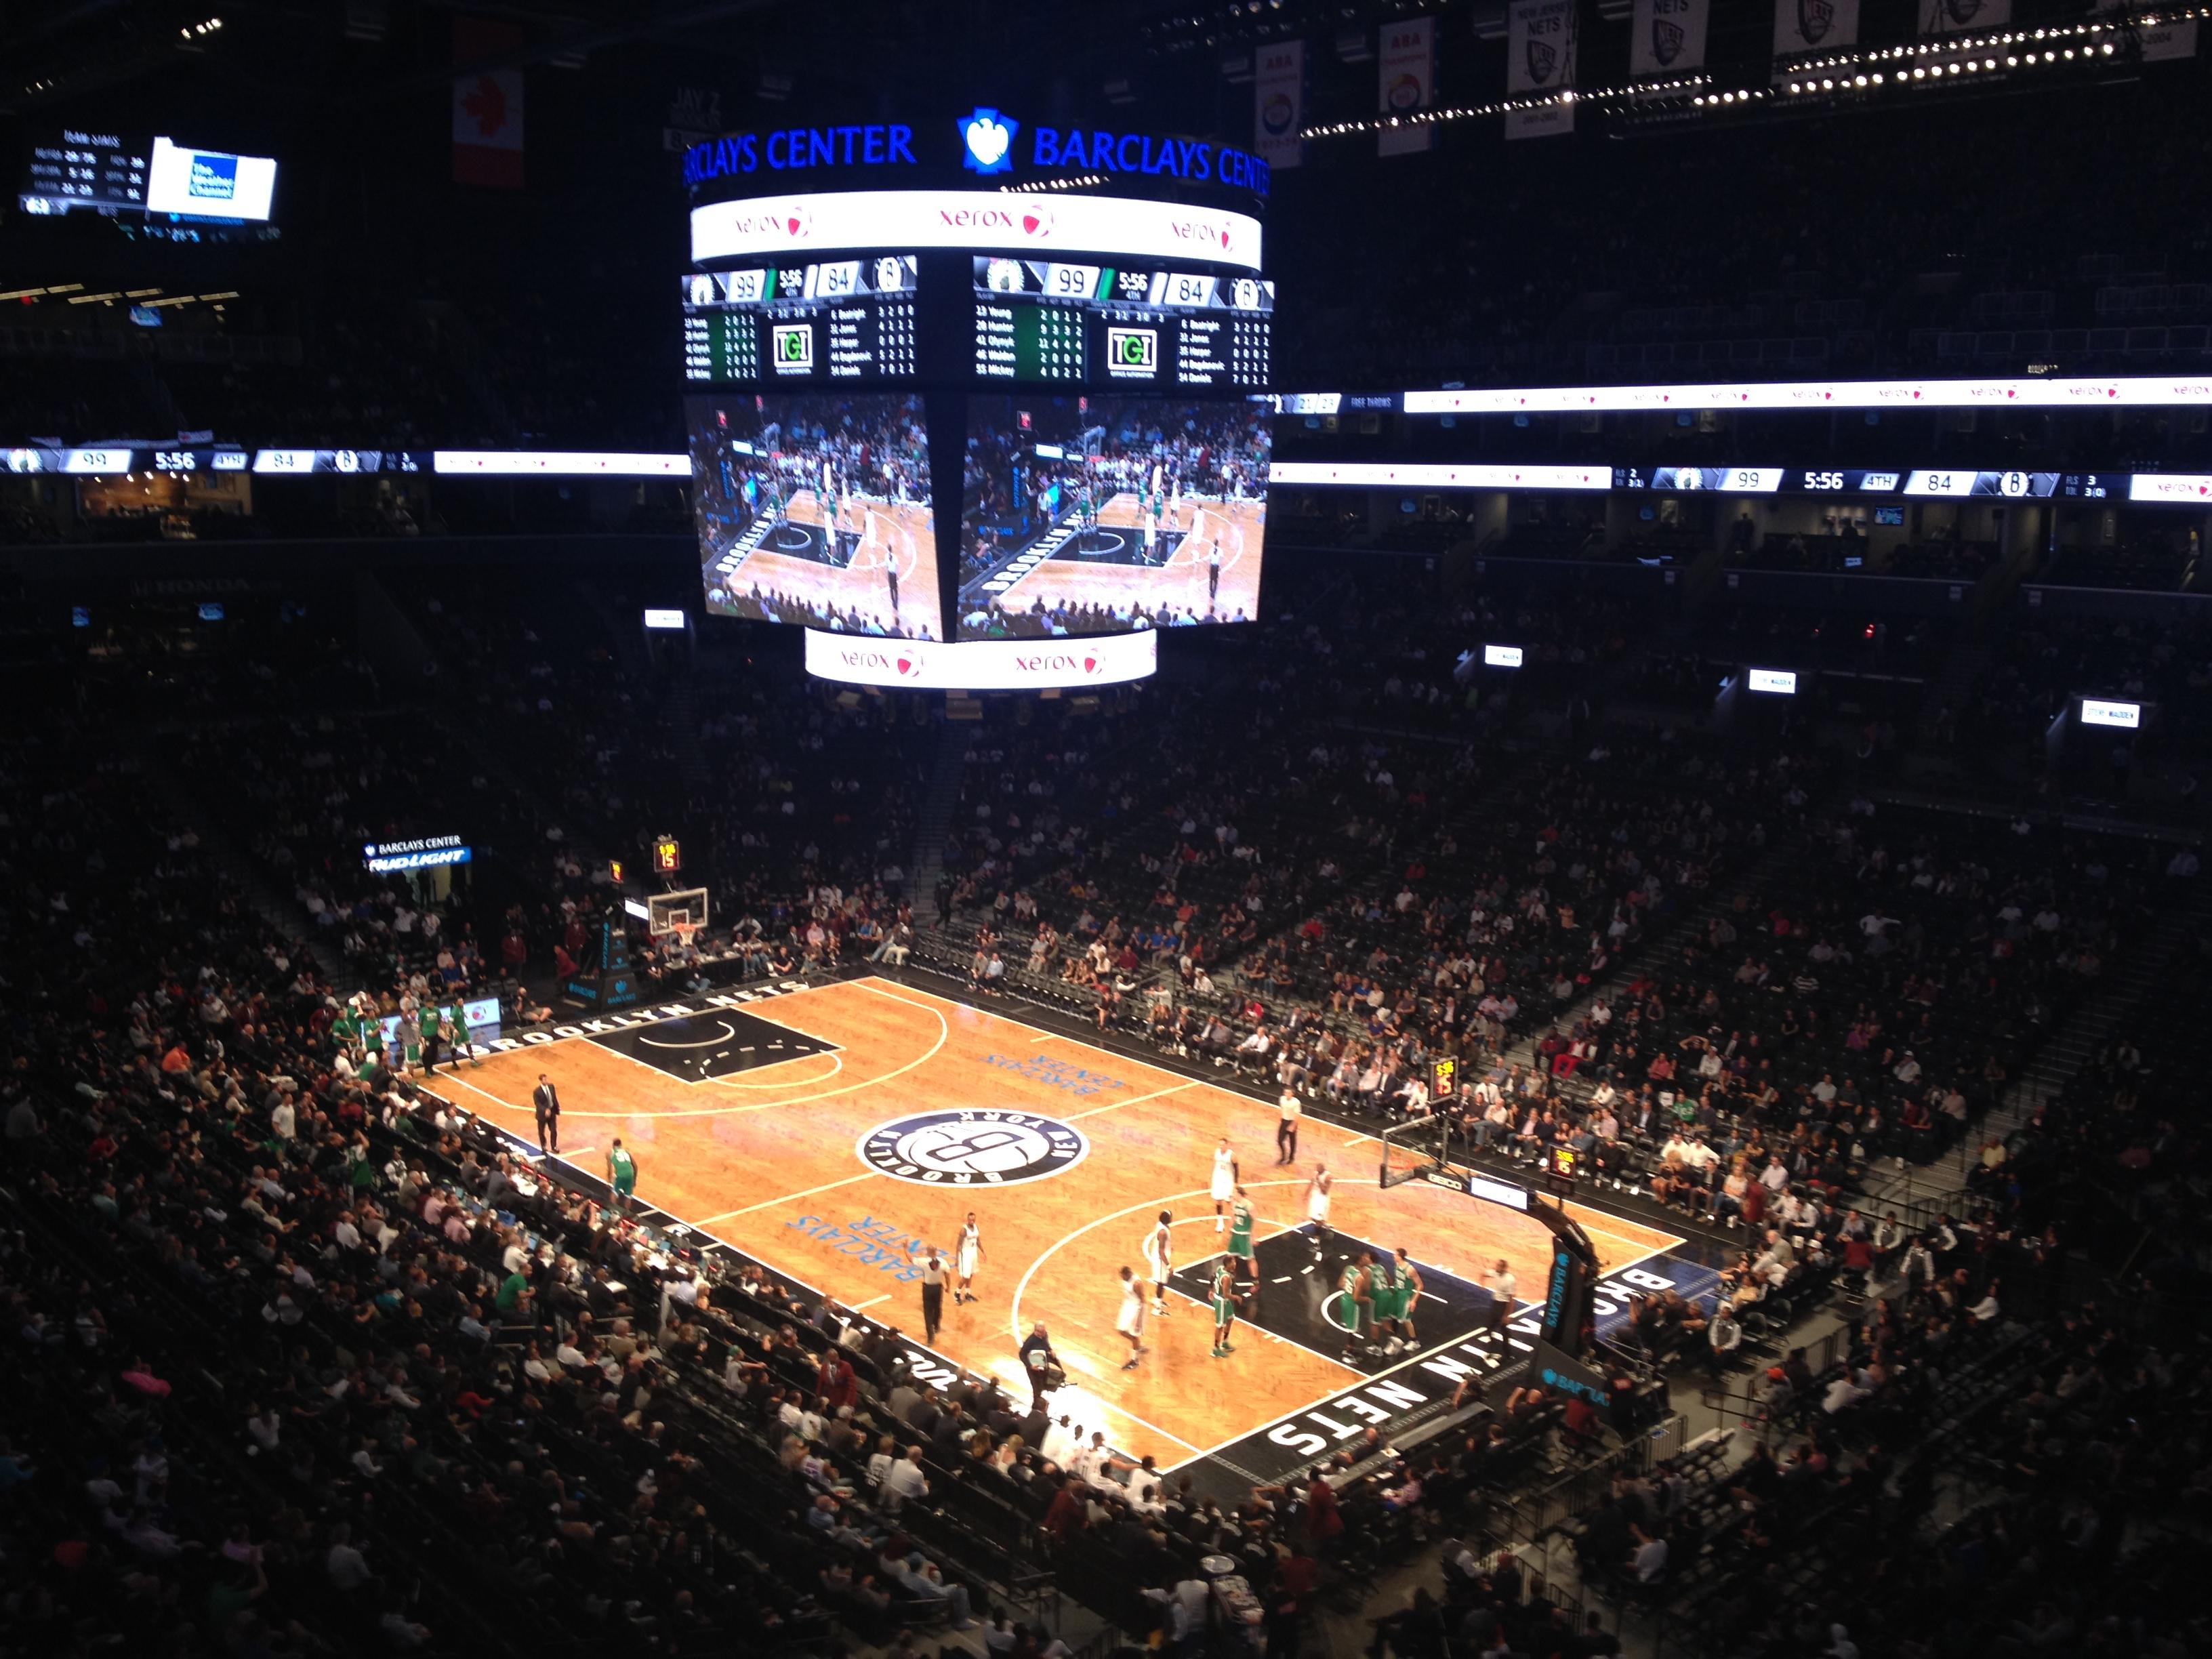 Barclays center experience NBA